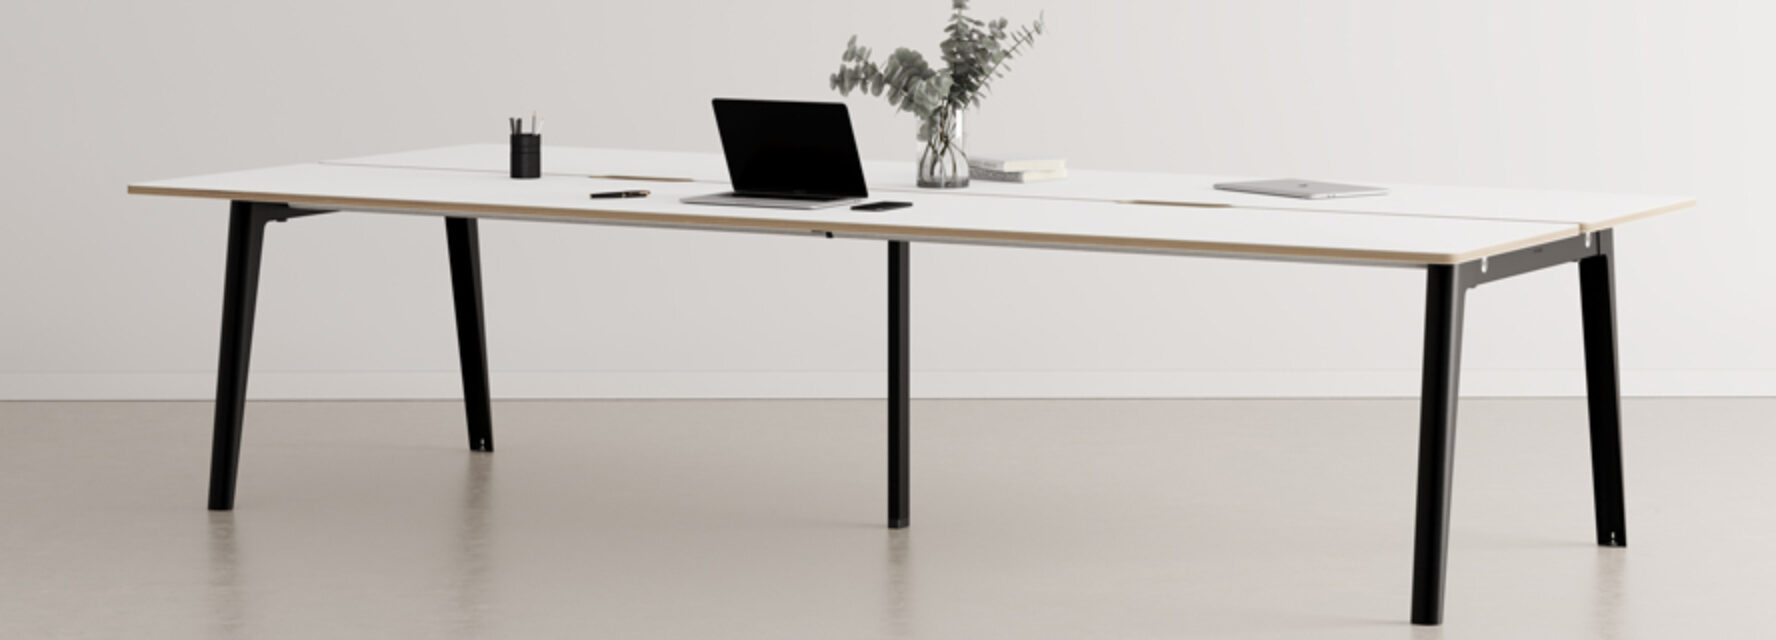 Office workstations - TIPTOE